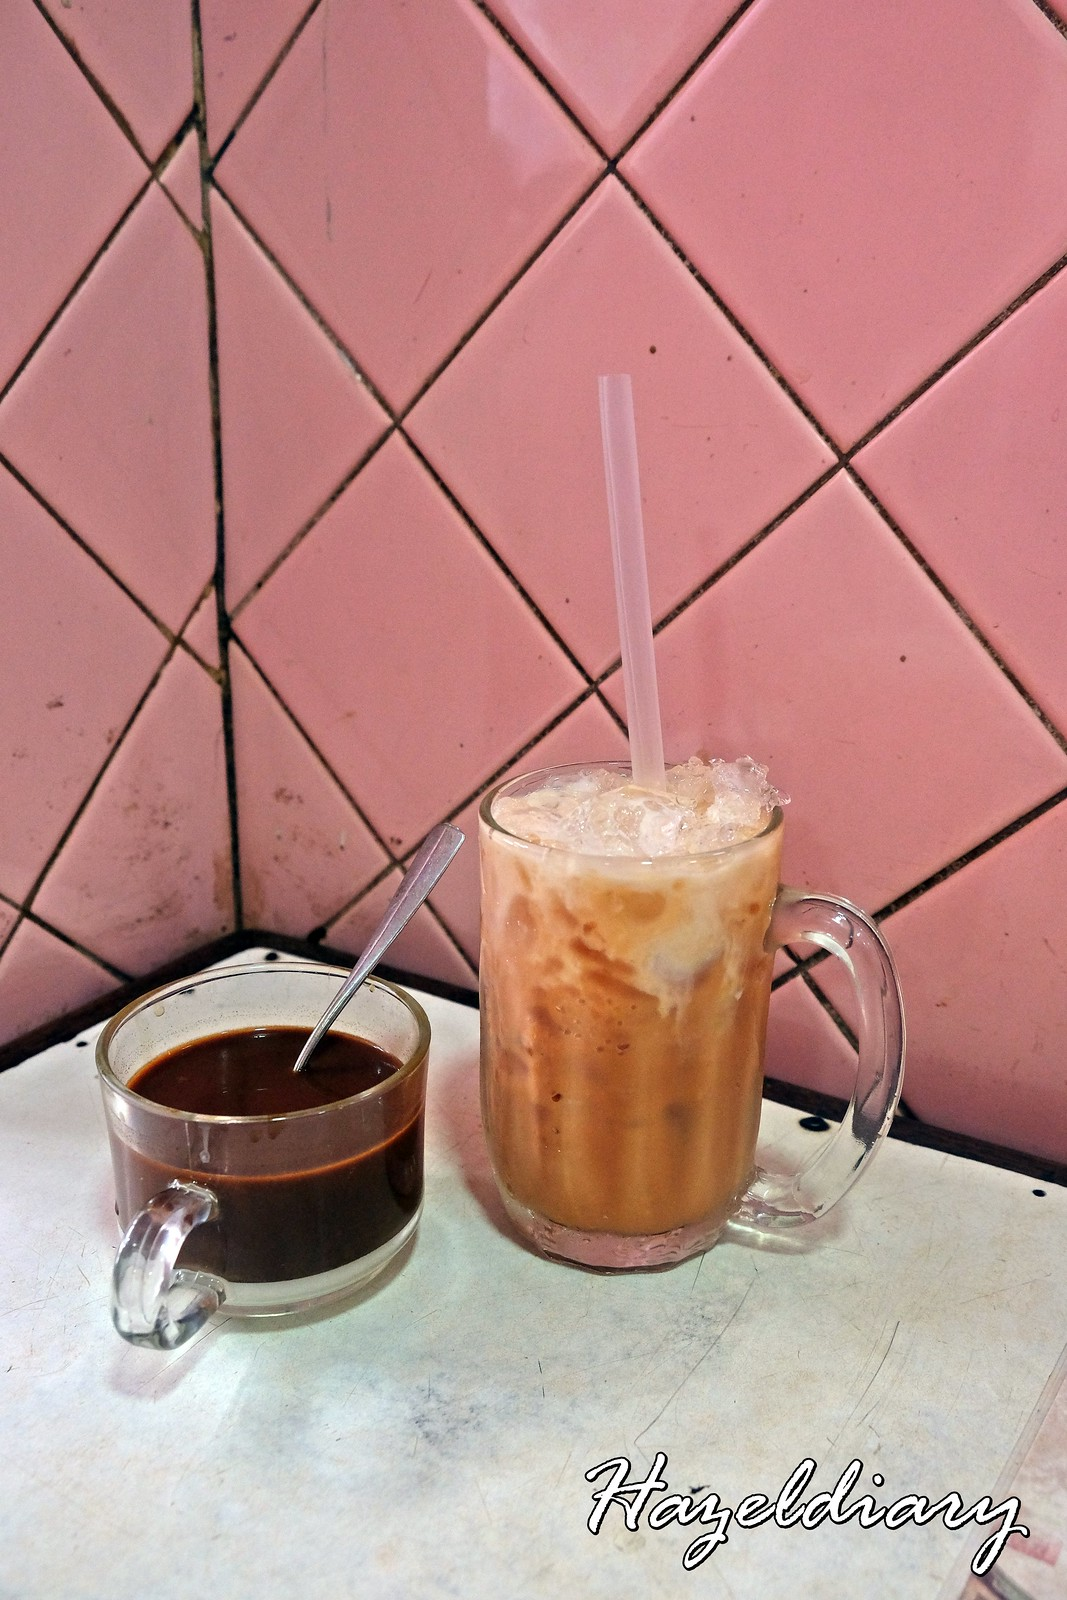 Eak Teng Yu Ki -Coffee and Ice tea with milk